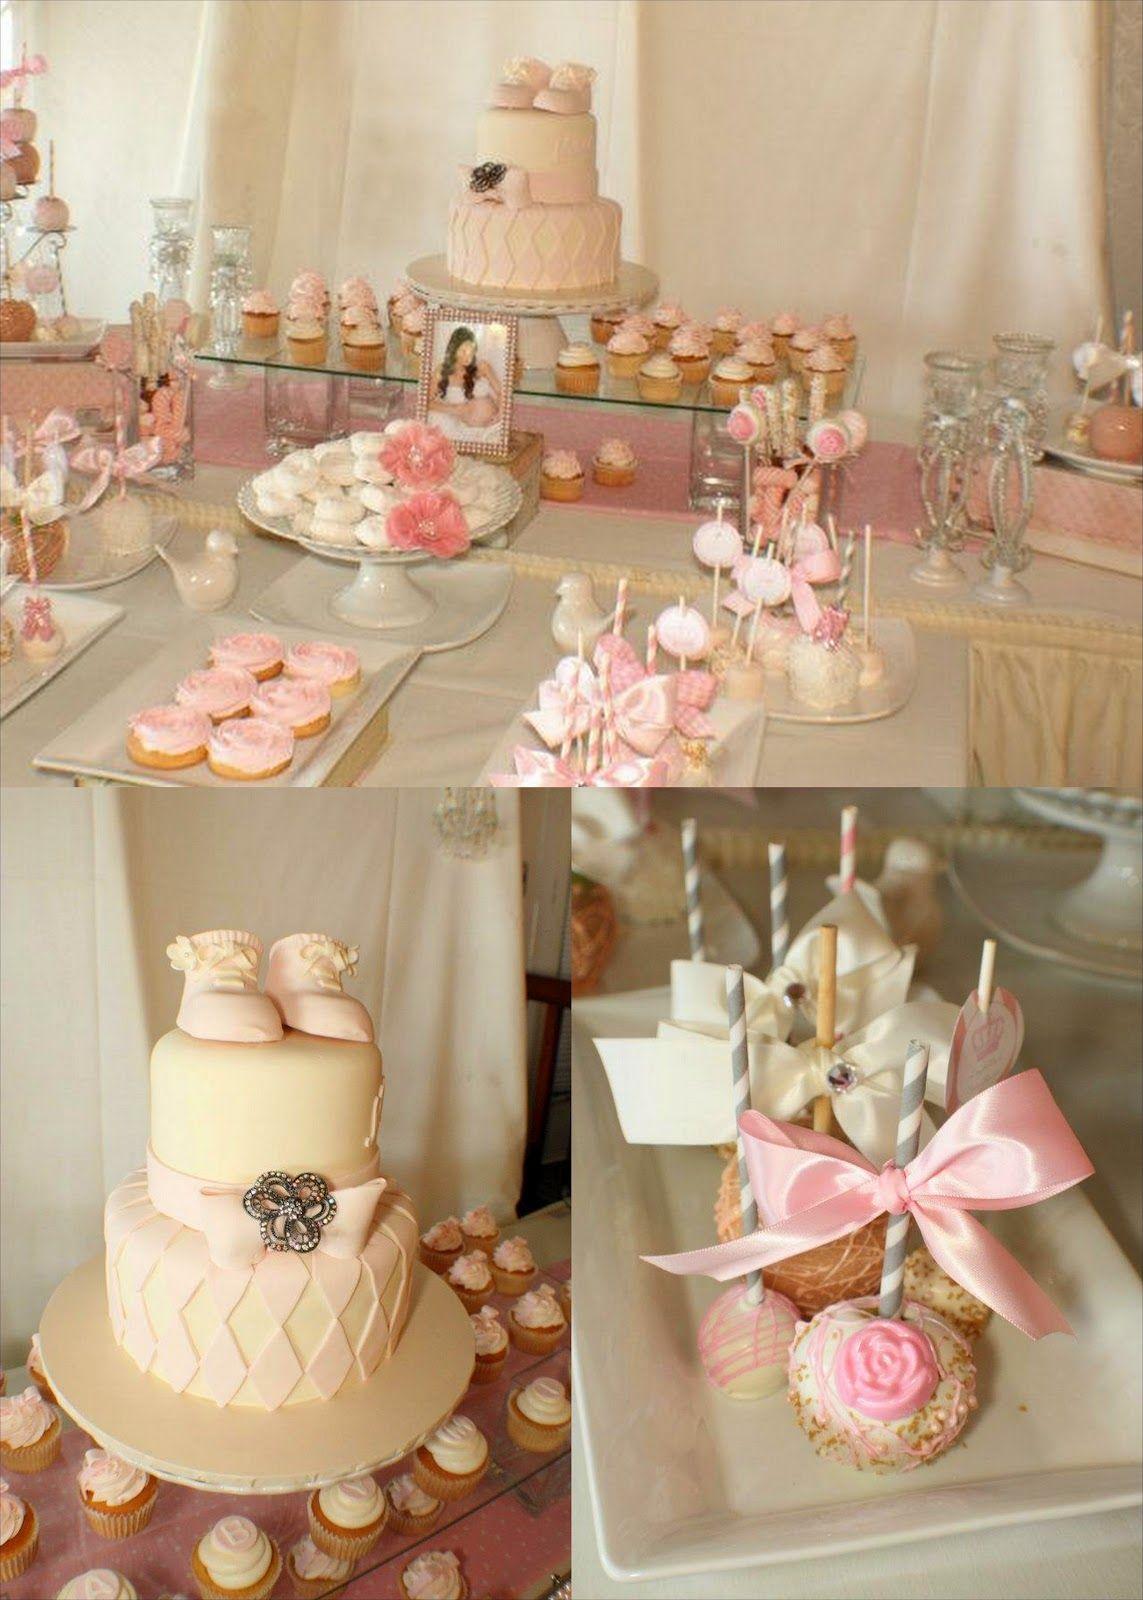 Shabby Chic Baby Cakes Mkr Creations Shabby Chic Baby